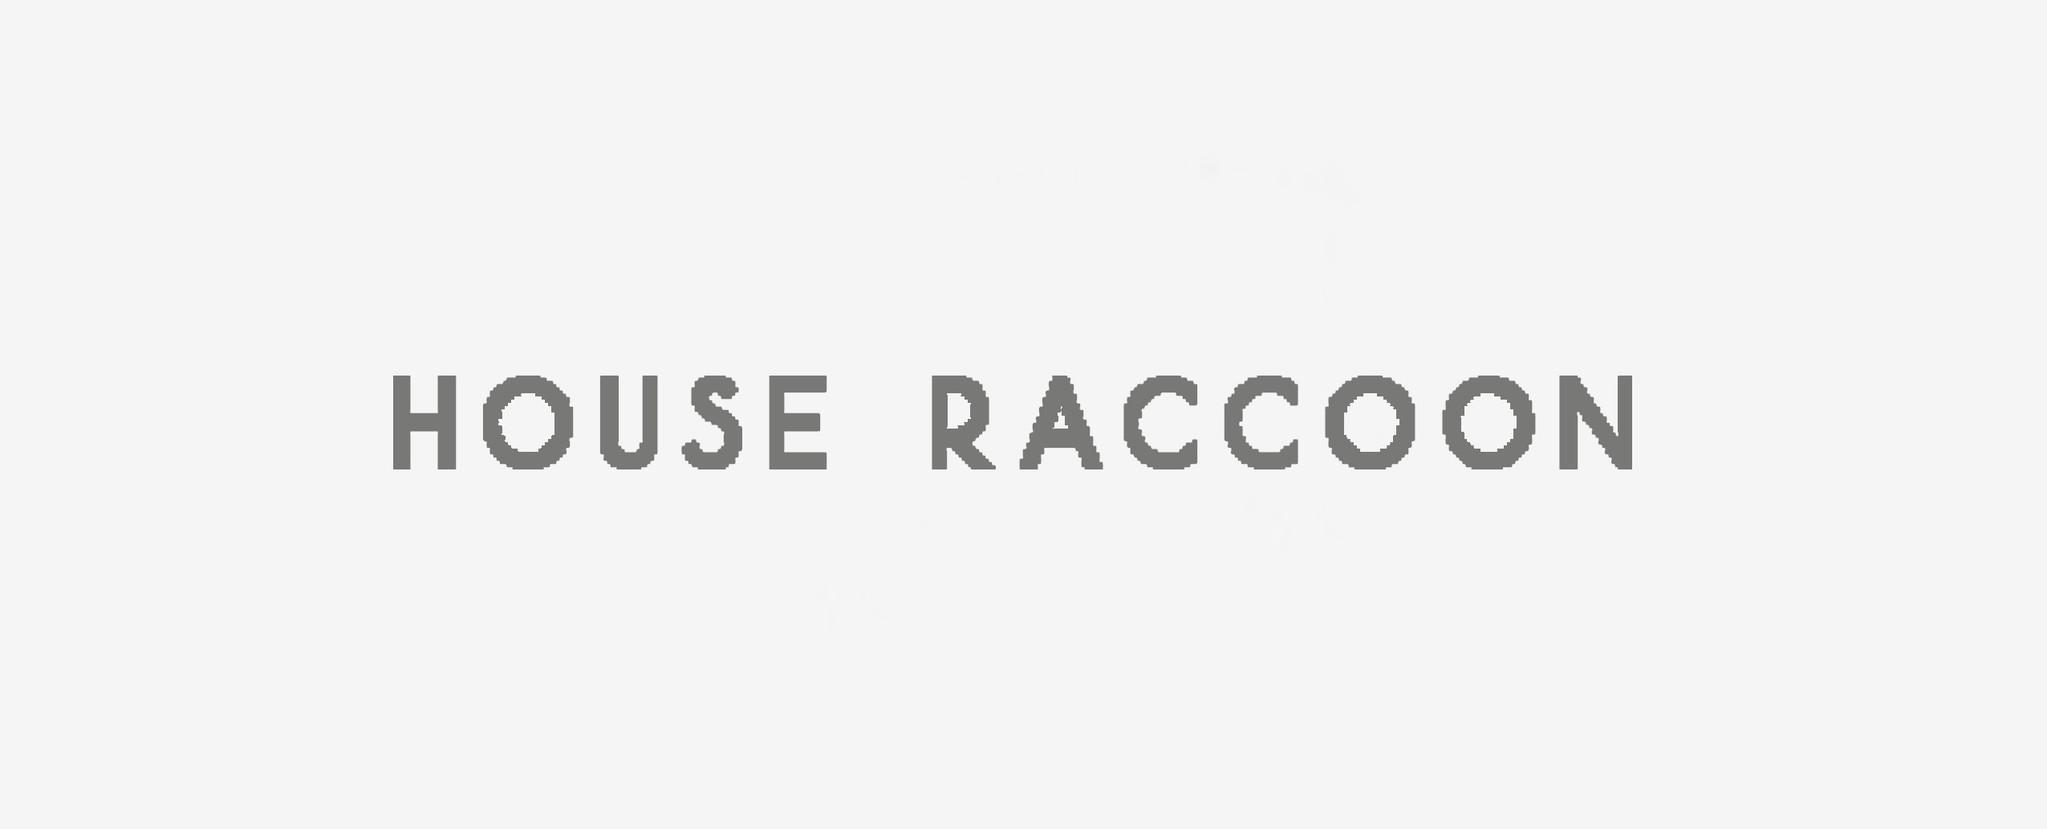 House Raccoon